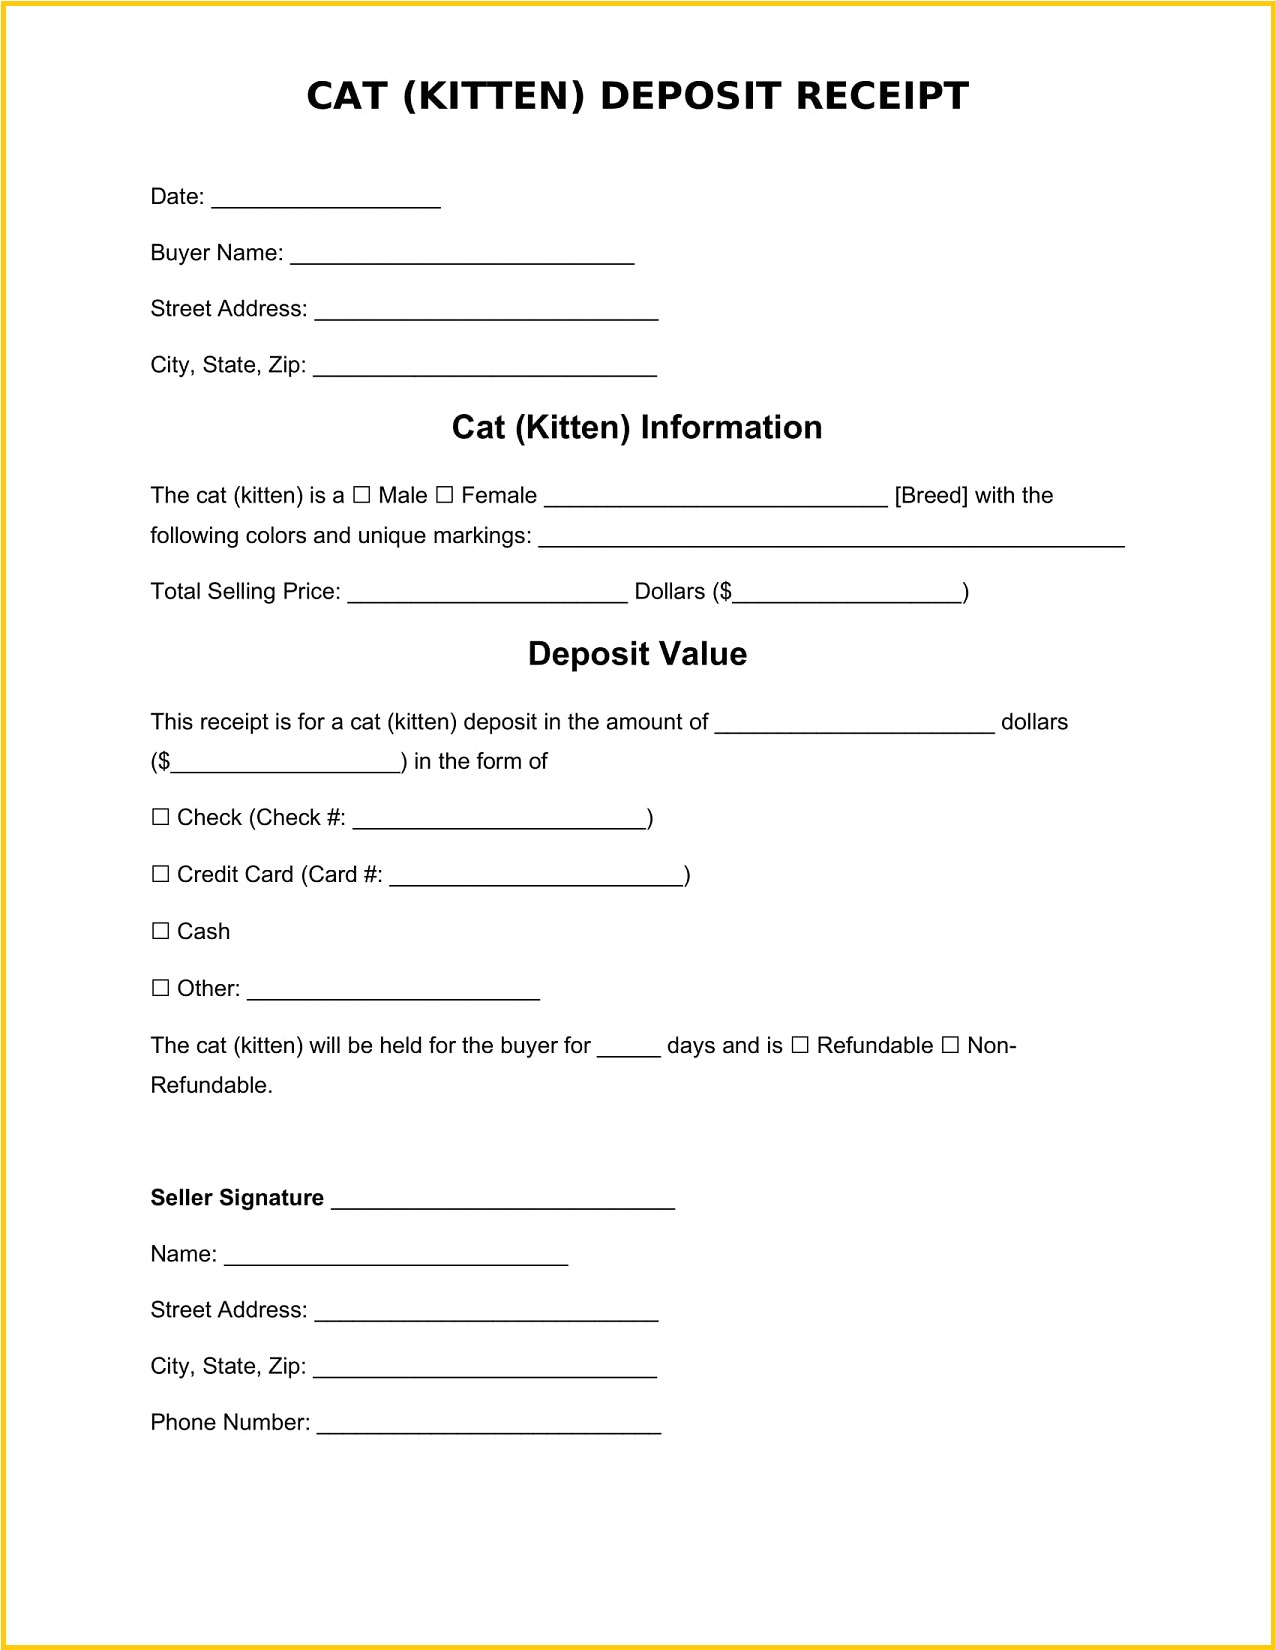 Cat Deposit Receipt Word Template